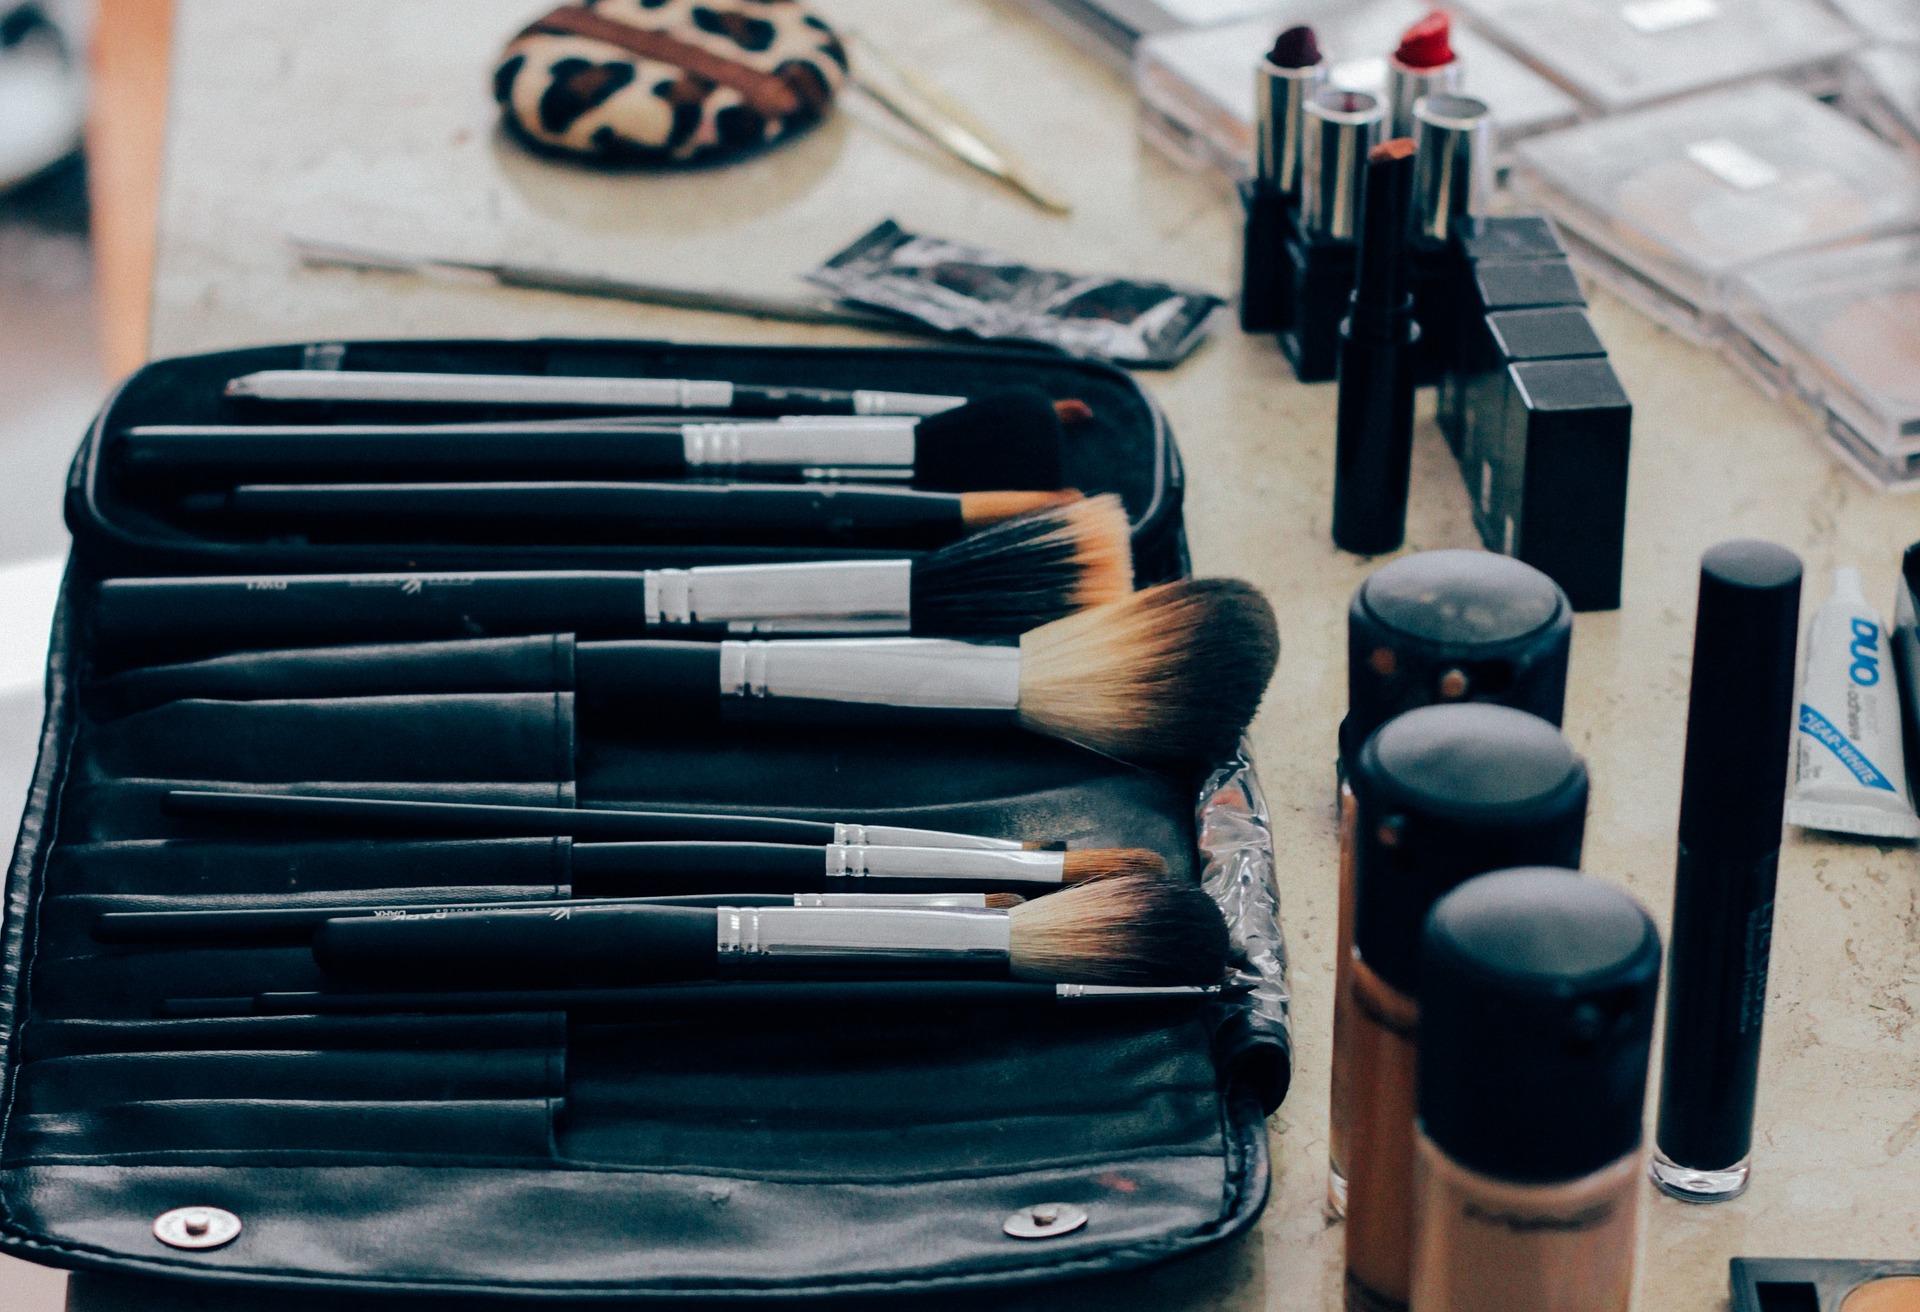 makeup, drugstore makeup, foundation, summer look,.mascara, blush, facial wash,bb cream, tinted moisturizer, foundation, eyeliner, eyeshadow, lip balm,